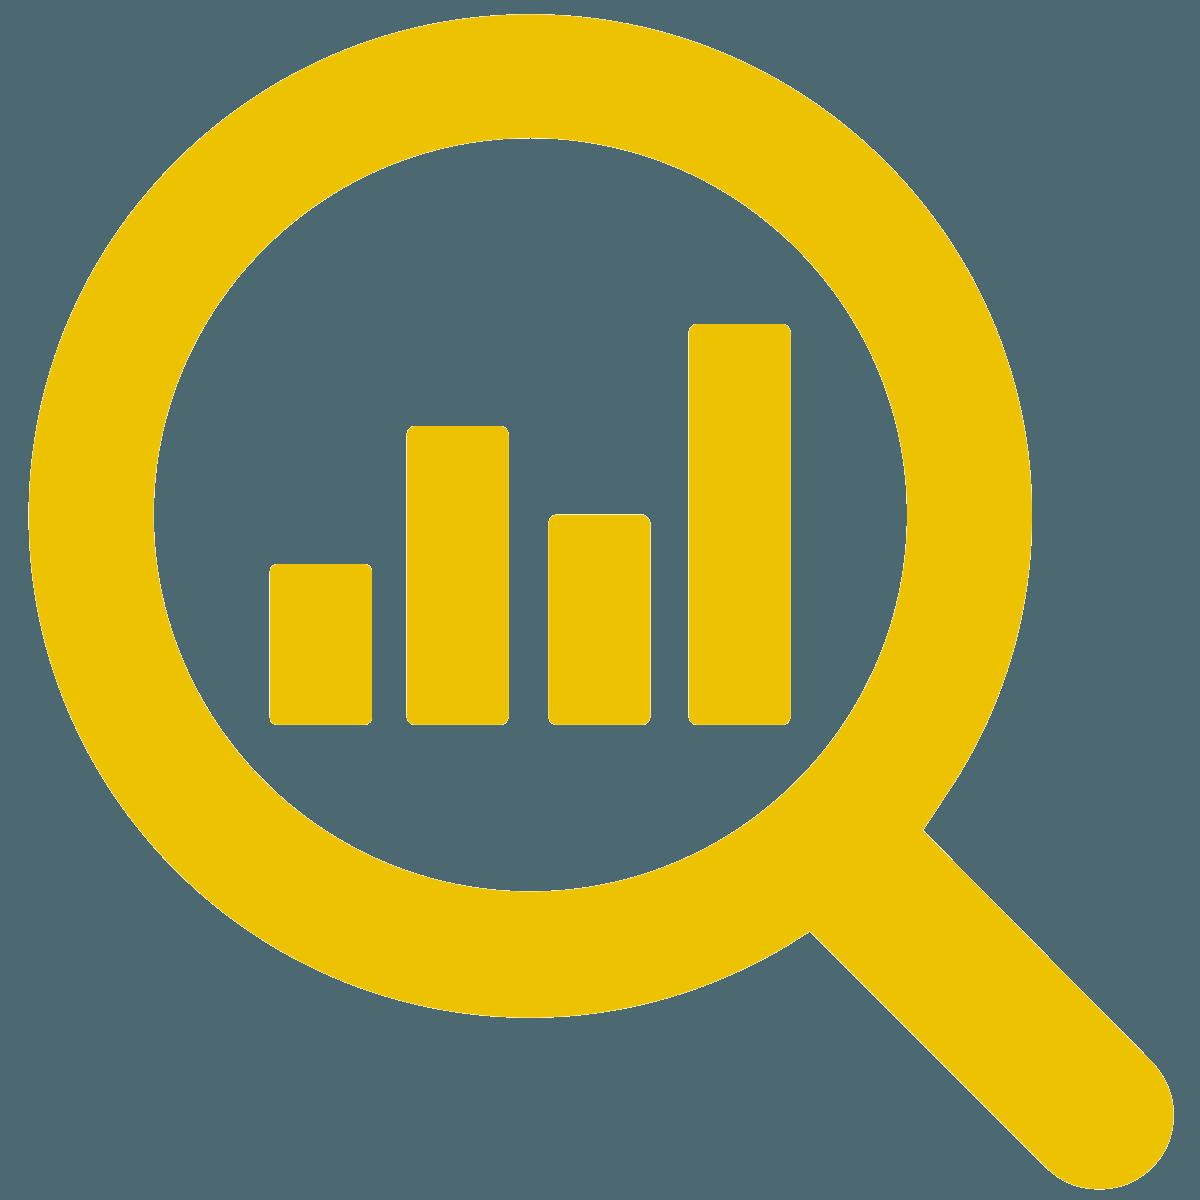 noun analysis 853968 edc200 - SAP Analytics-Lösungen